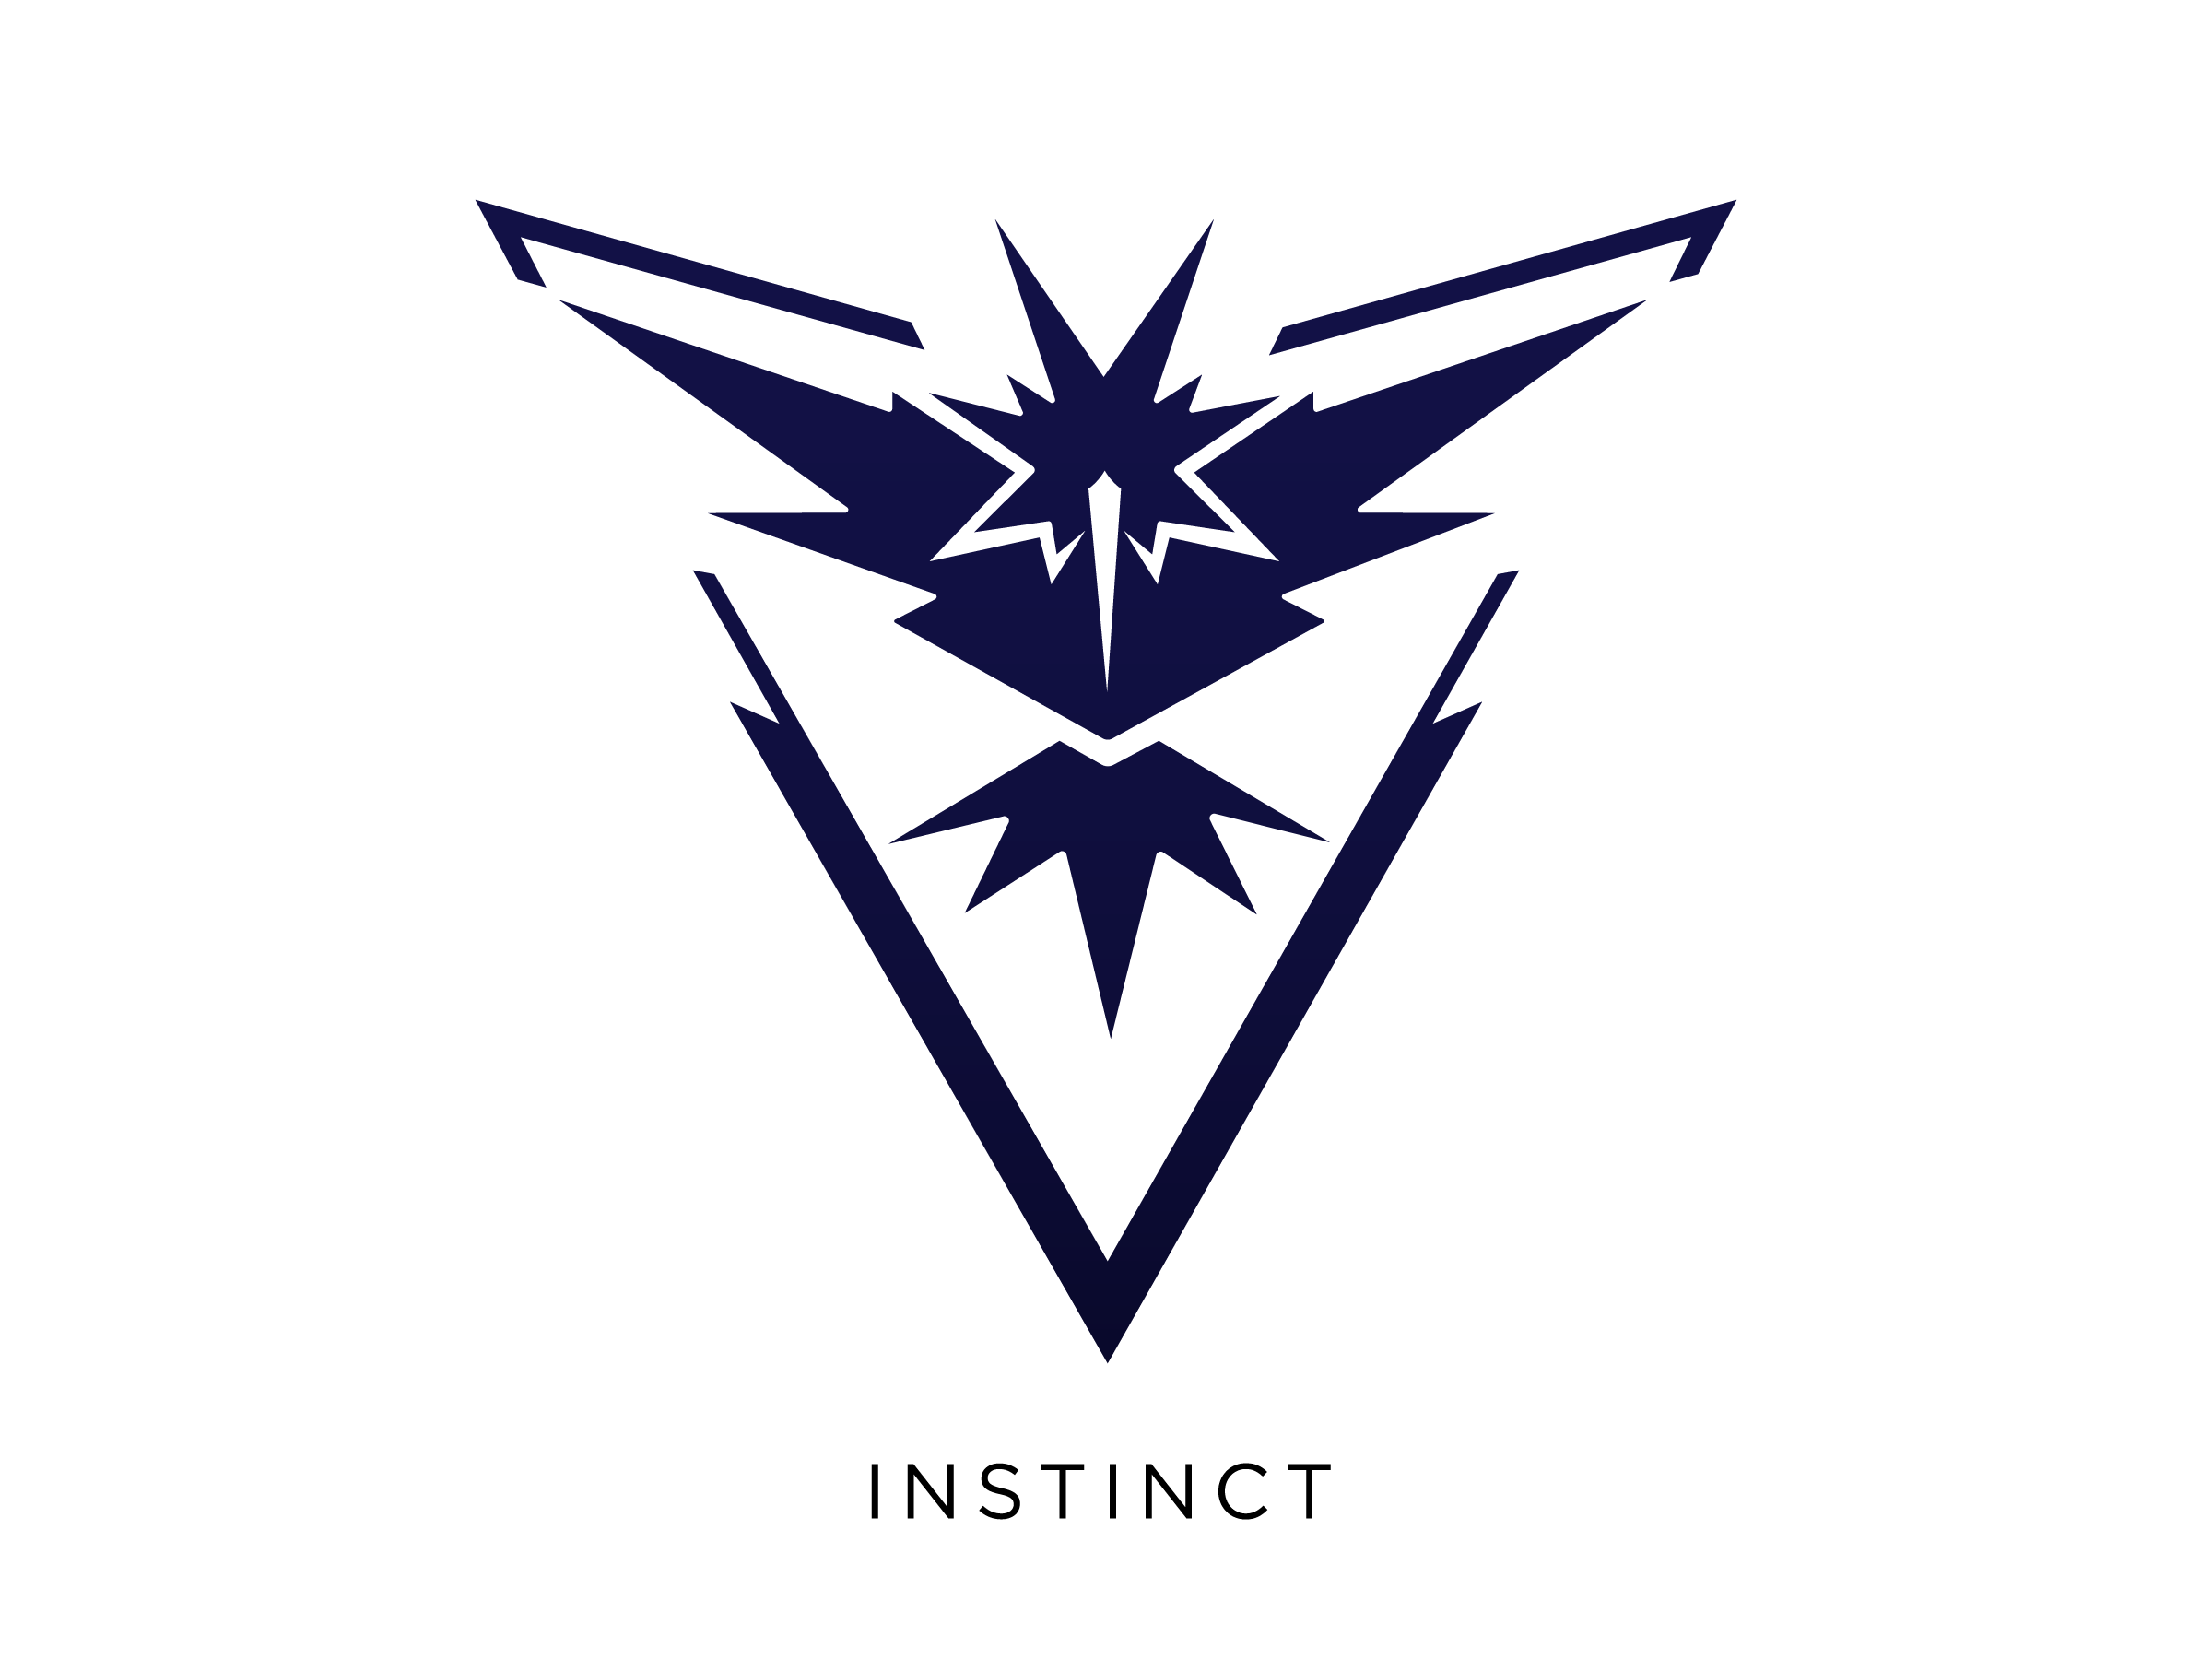 Sorry You Ve Been Rate Limited Vector Logo Pokemon Go Team Instinct Pokemon Go